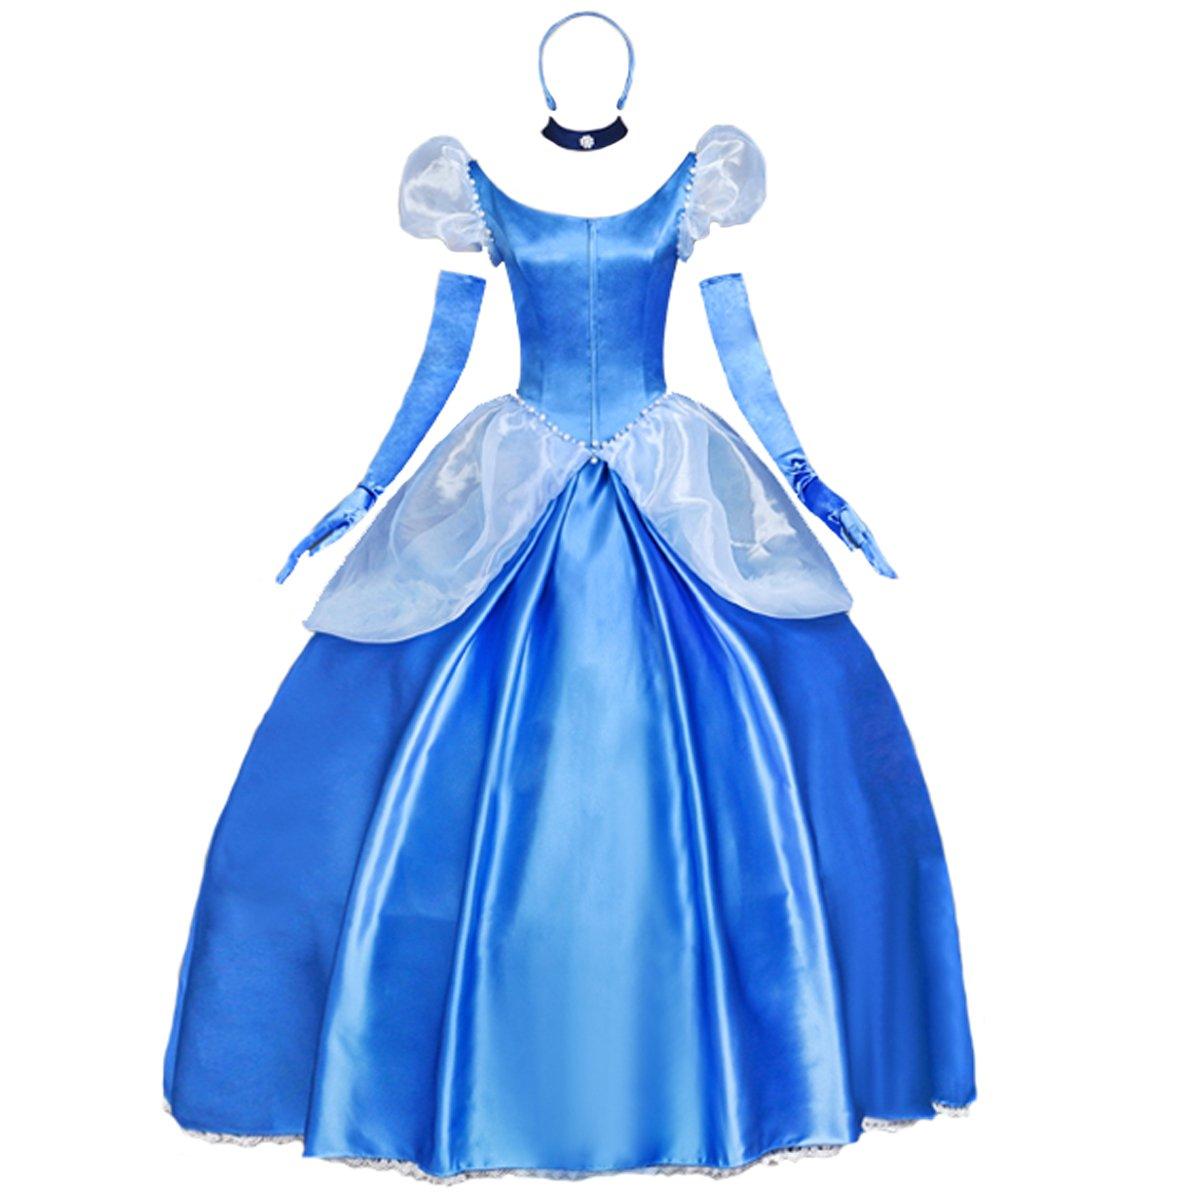 Angelaicos Womens Lolita Layered Party Costume Dress (XL, Blue)